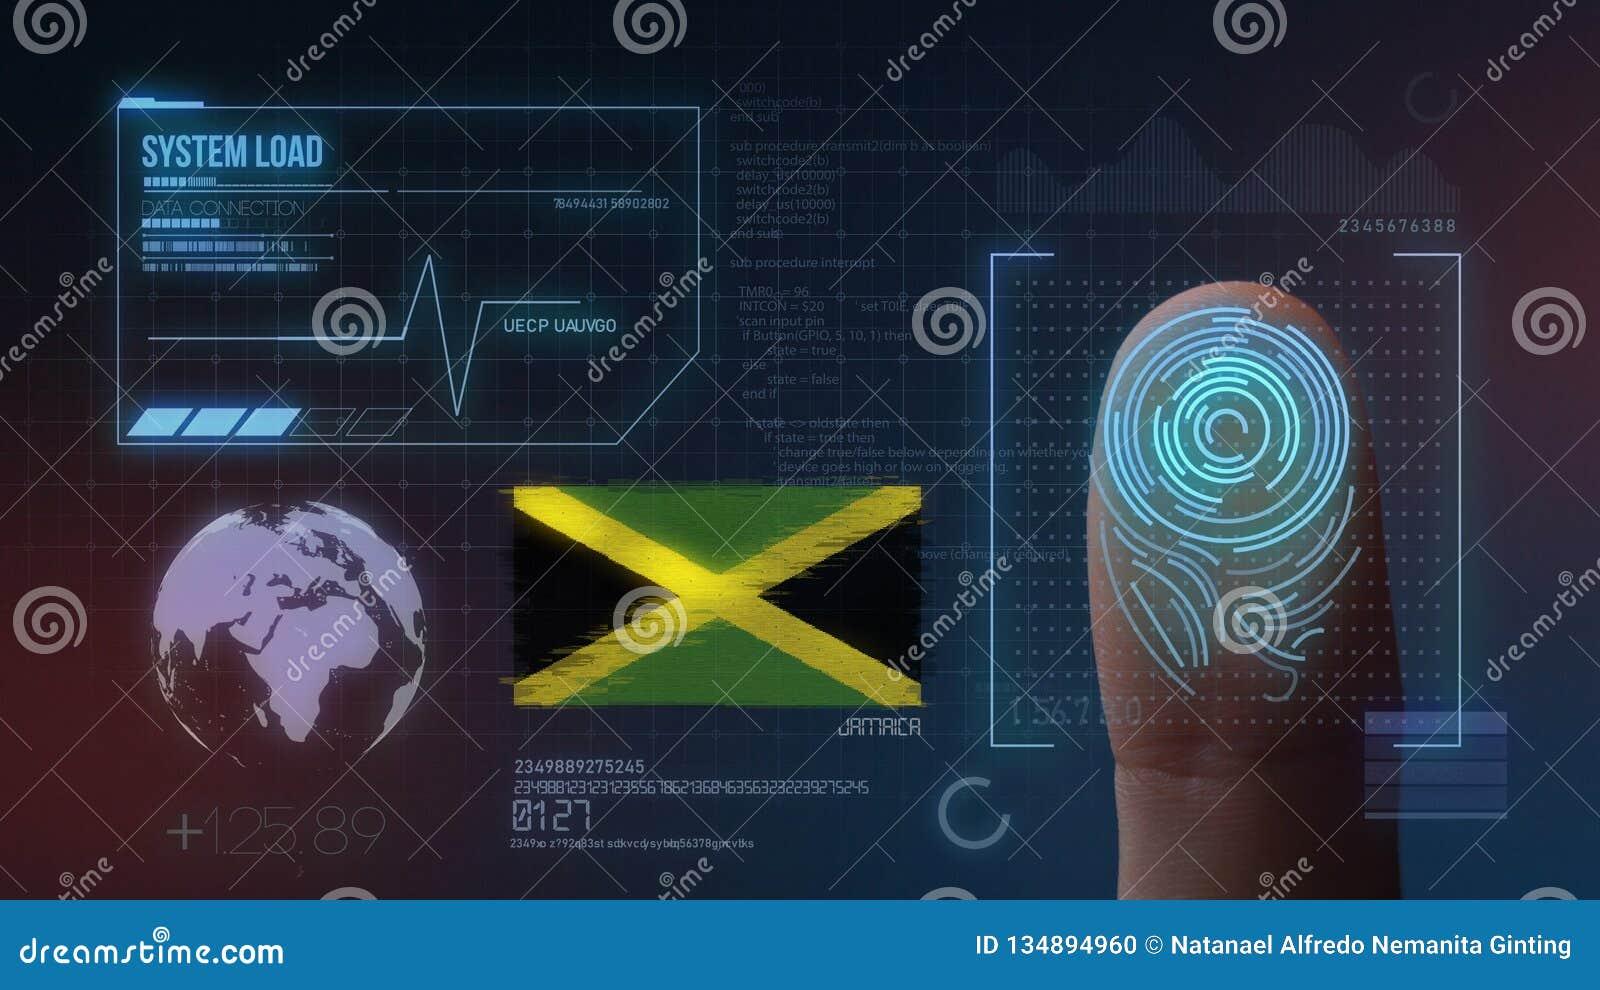 Finger Print Biometric Scanning Identification System. Jamaica Nationality